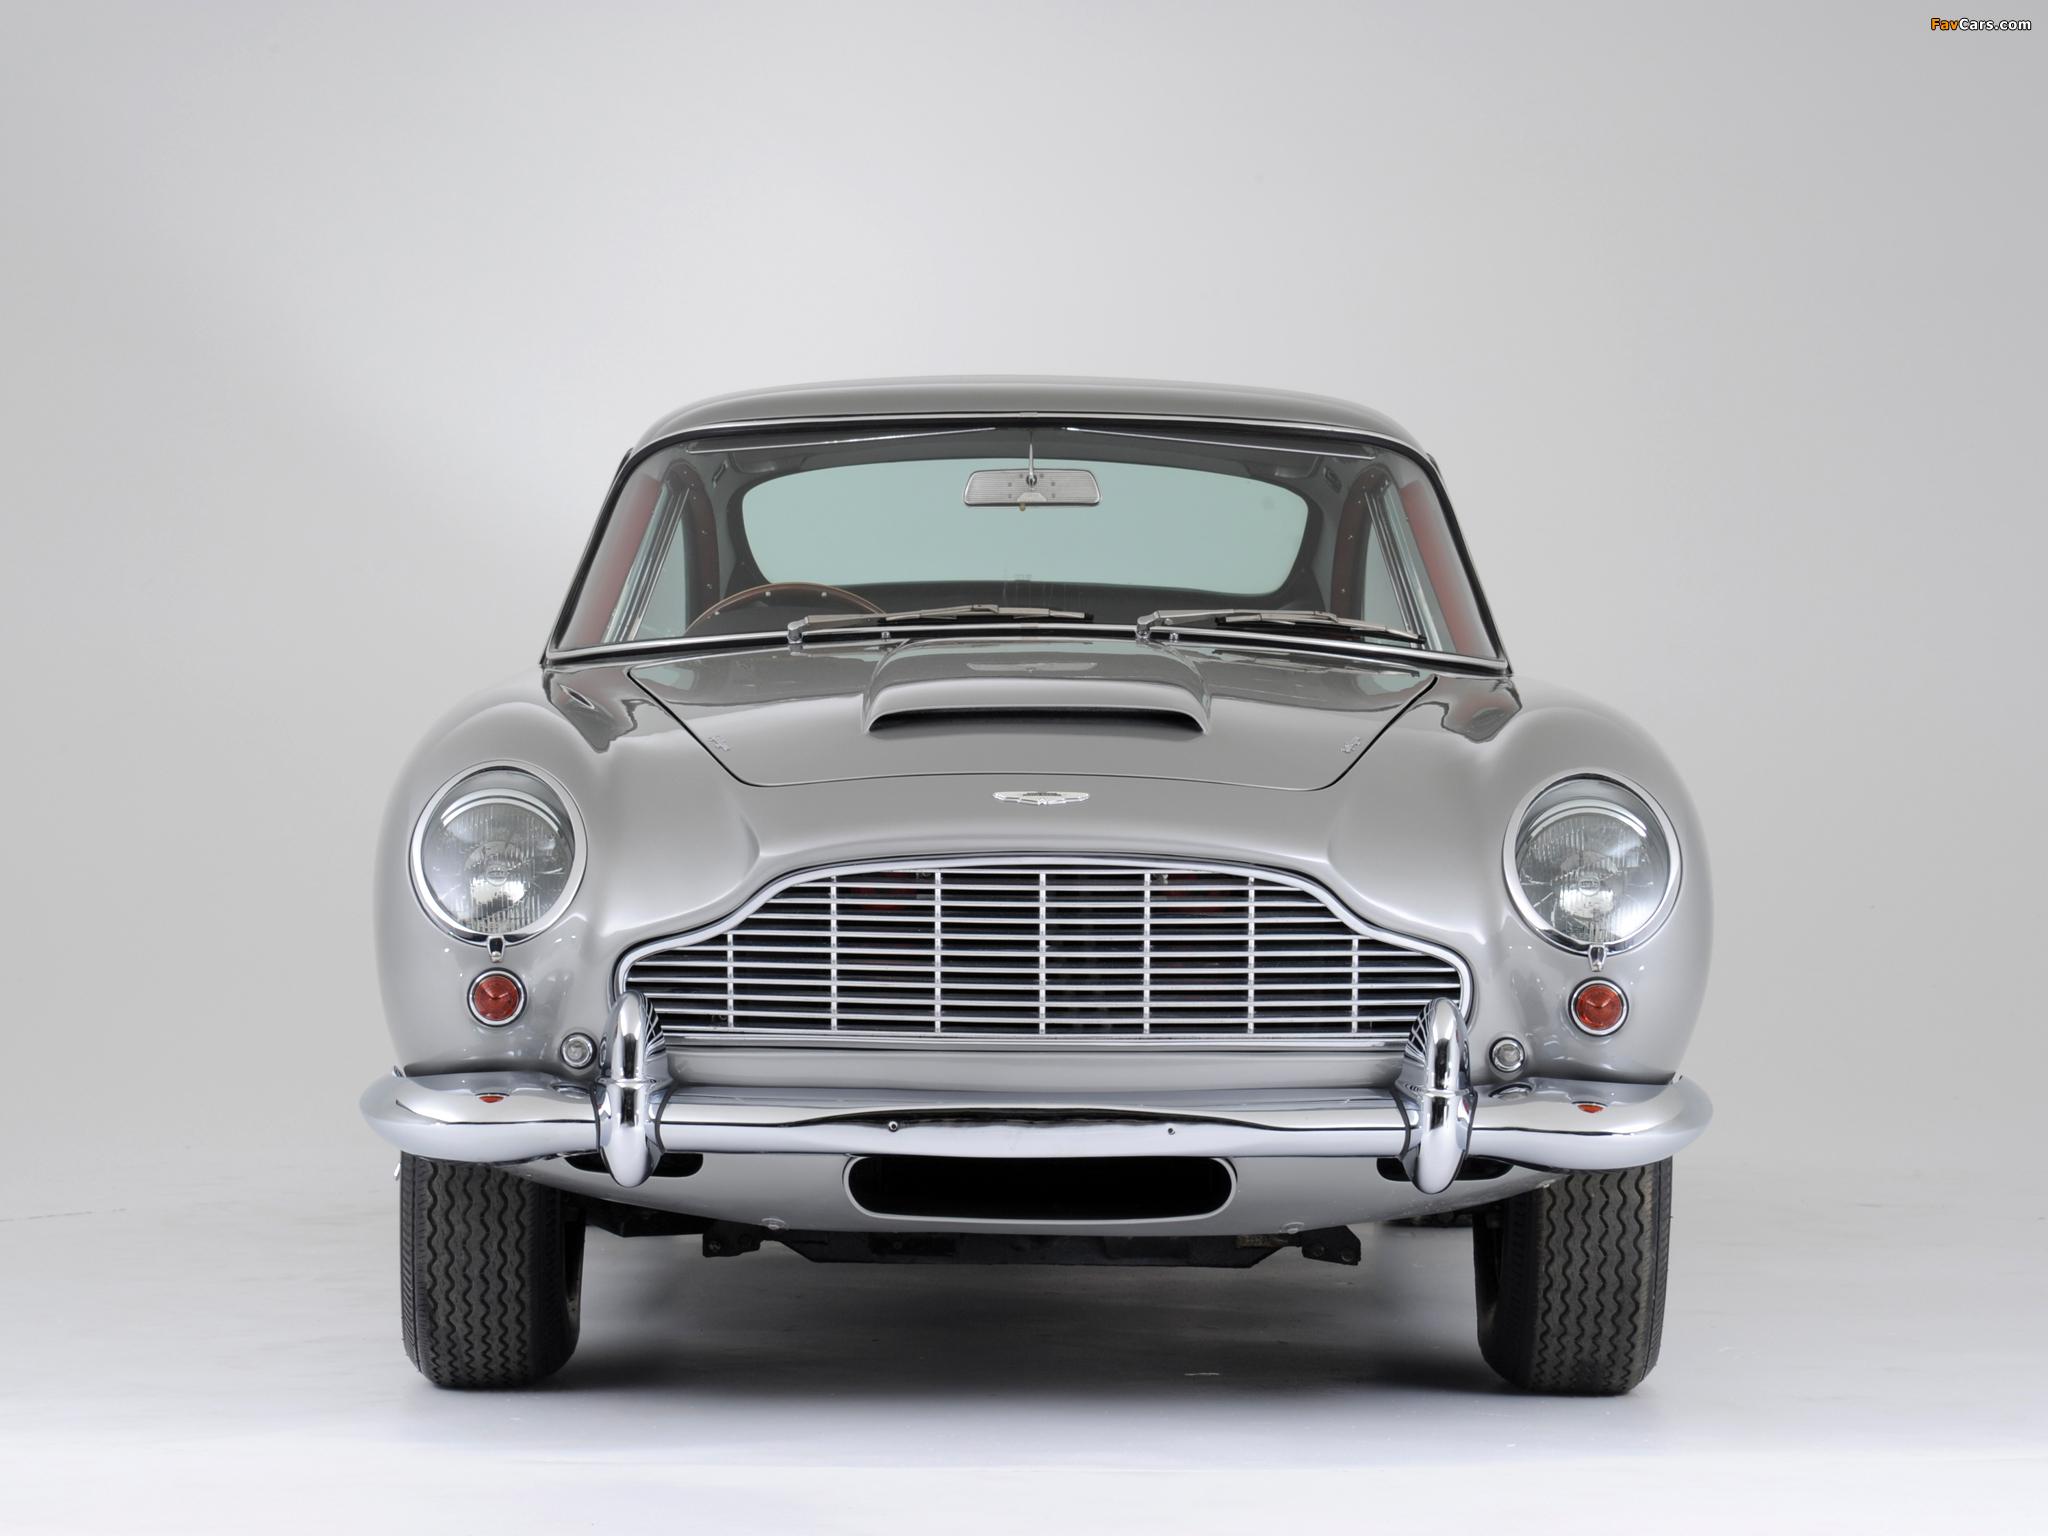 Aston Martin Db5 Vantage Uk Spec 1964 1965 Wallpapers